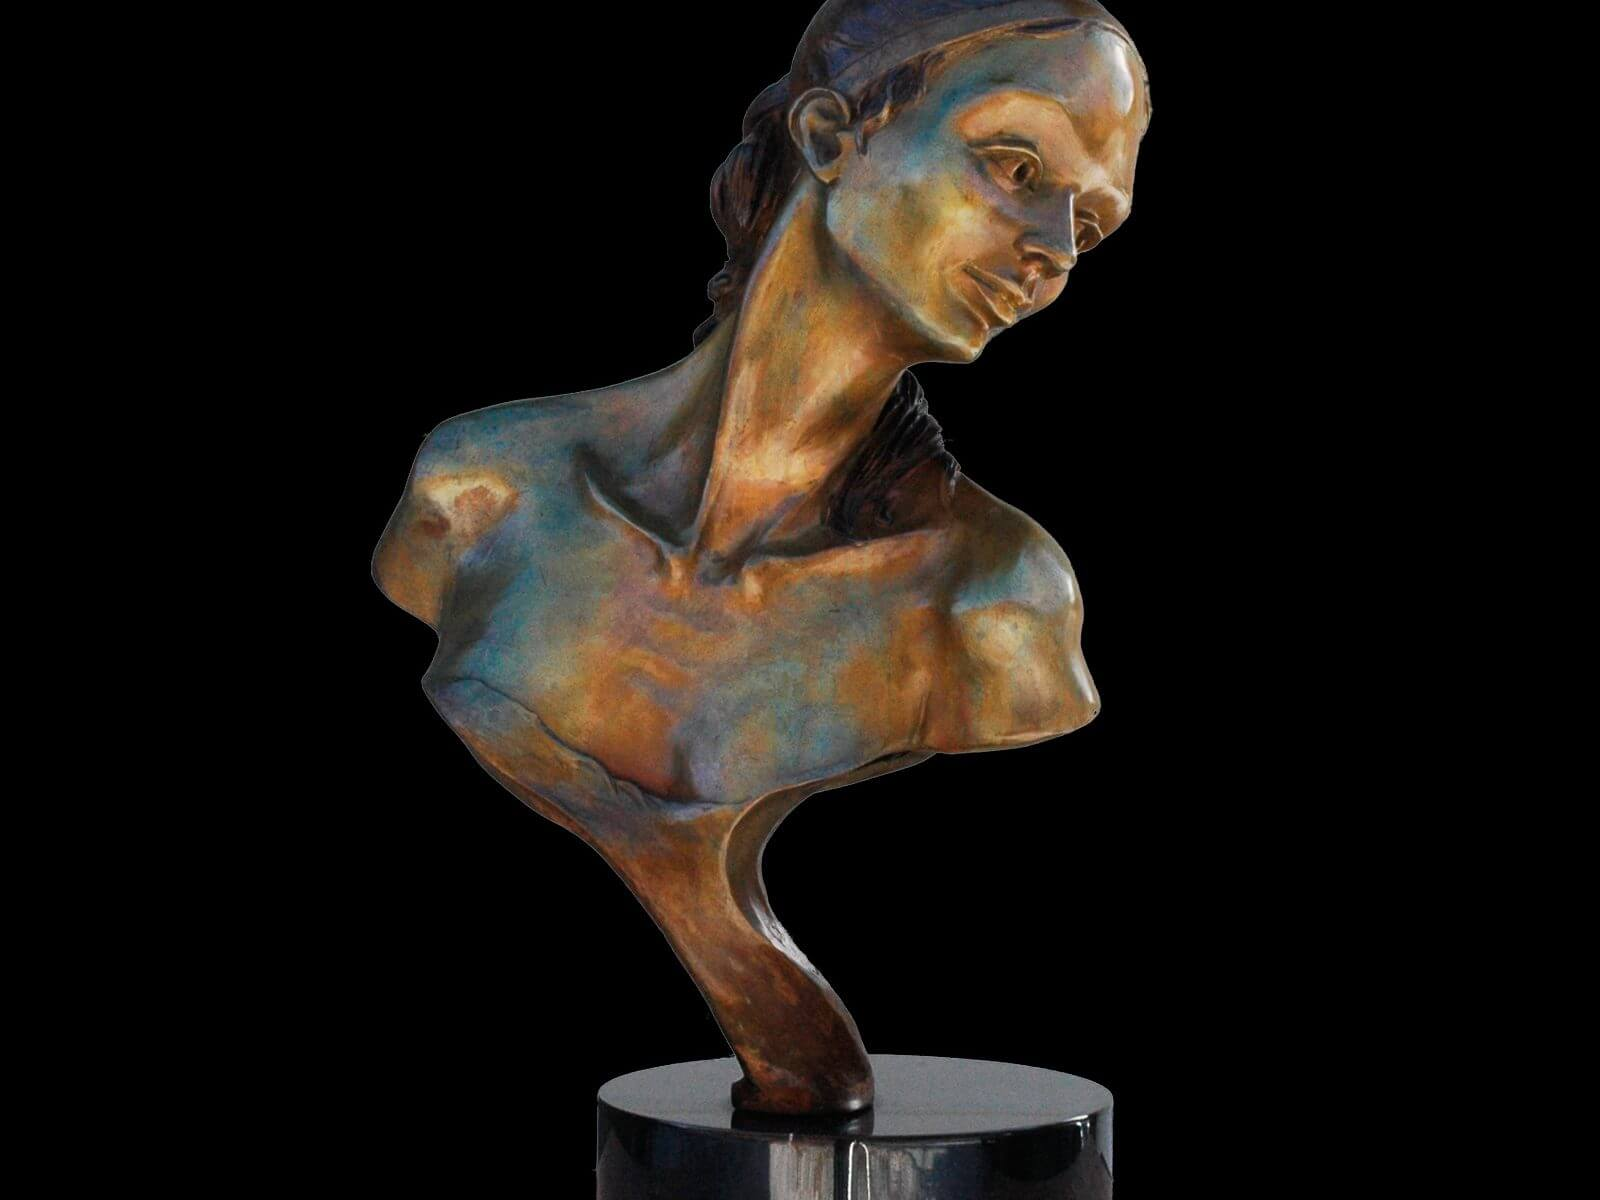 Nocturne bust of a female bronze ballet dancer by sculptor Andrew DeVries